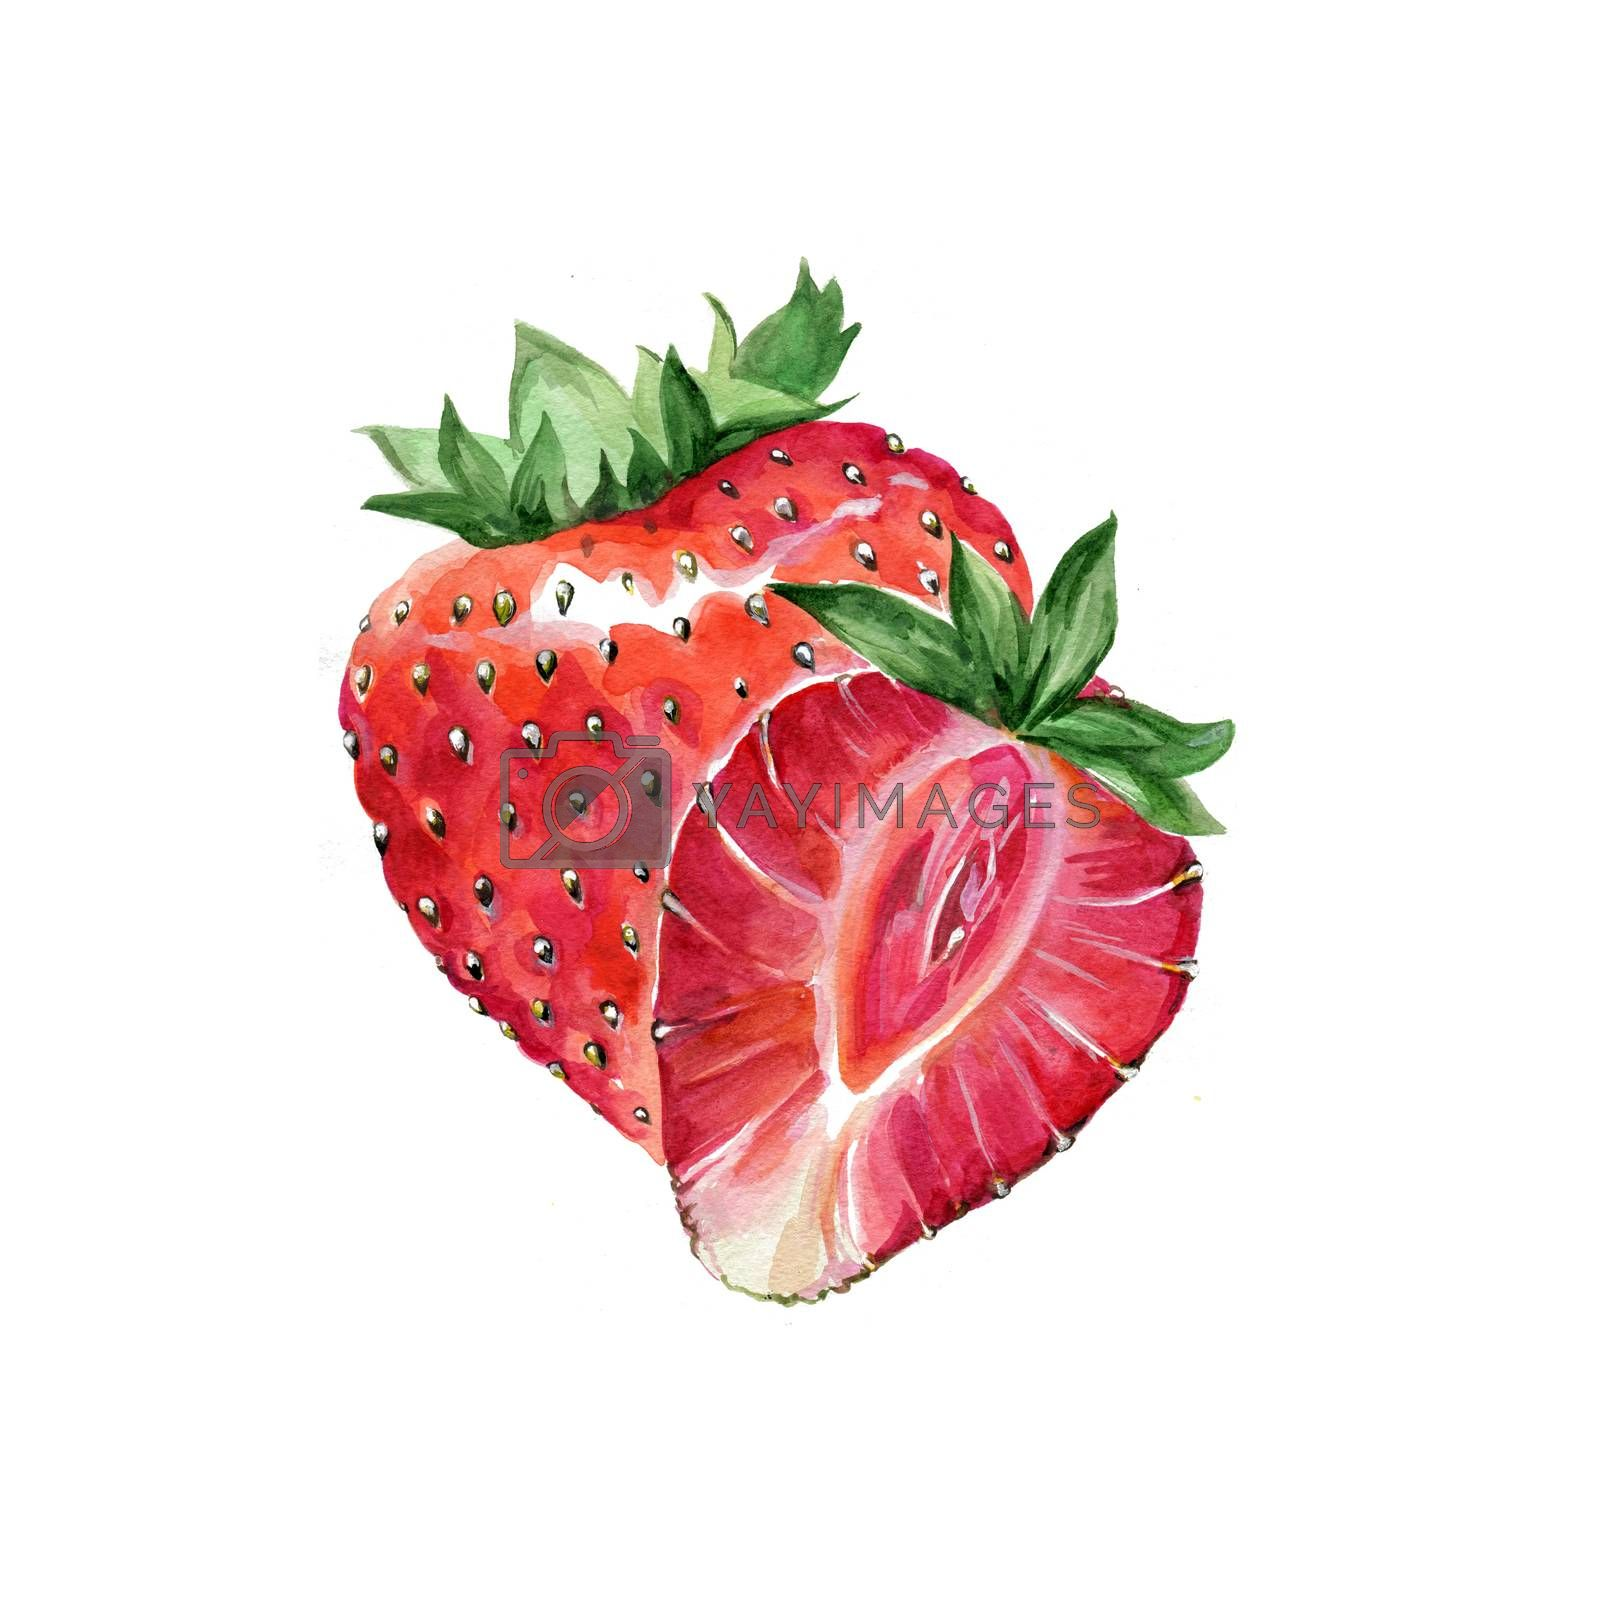 Watercolor Strawberries. Hand Drawn Illustration Organic Food Vegetarian Ingredient